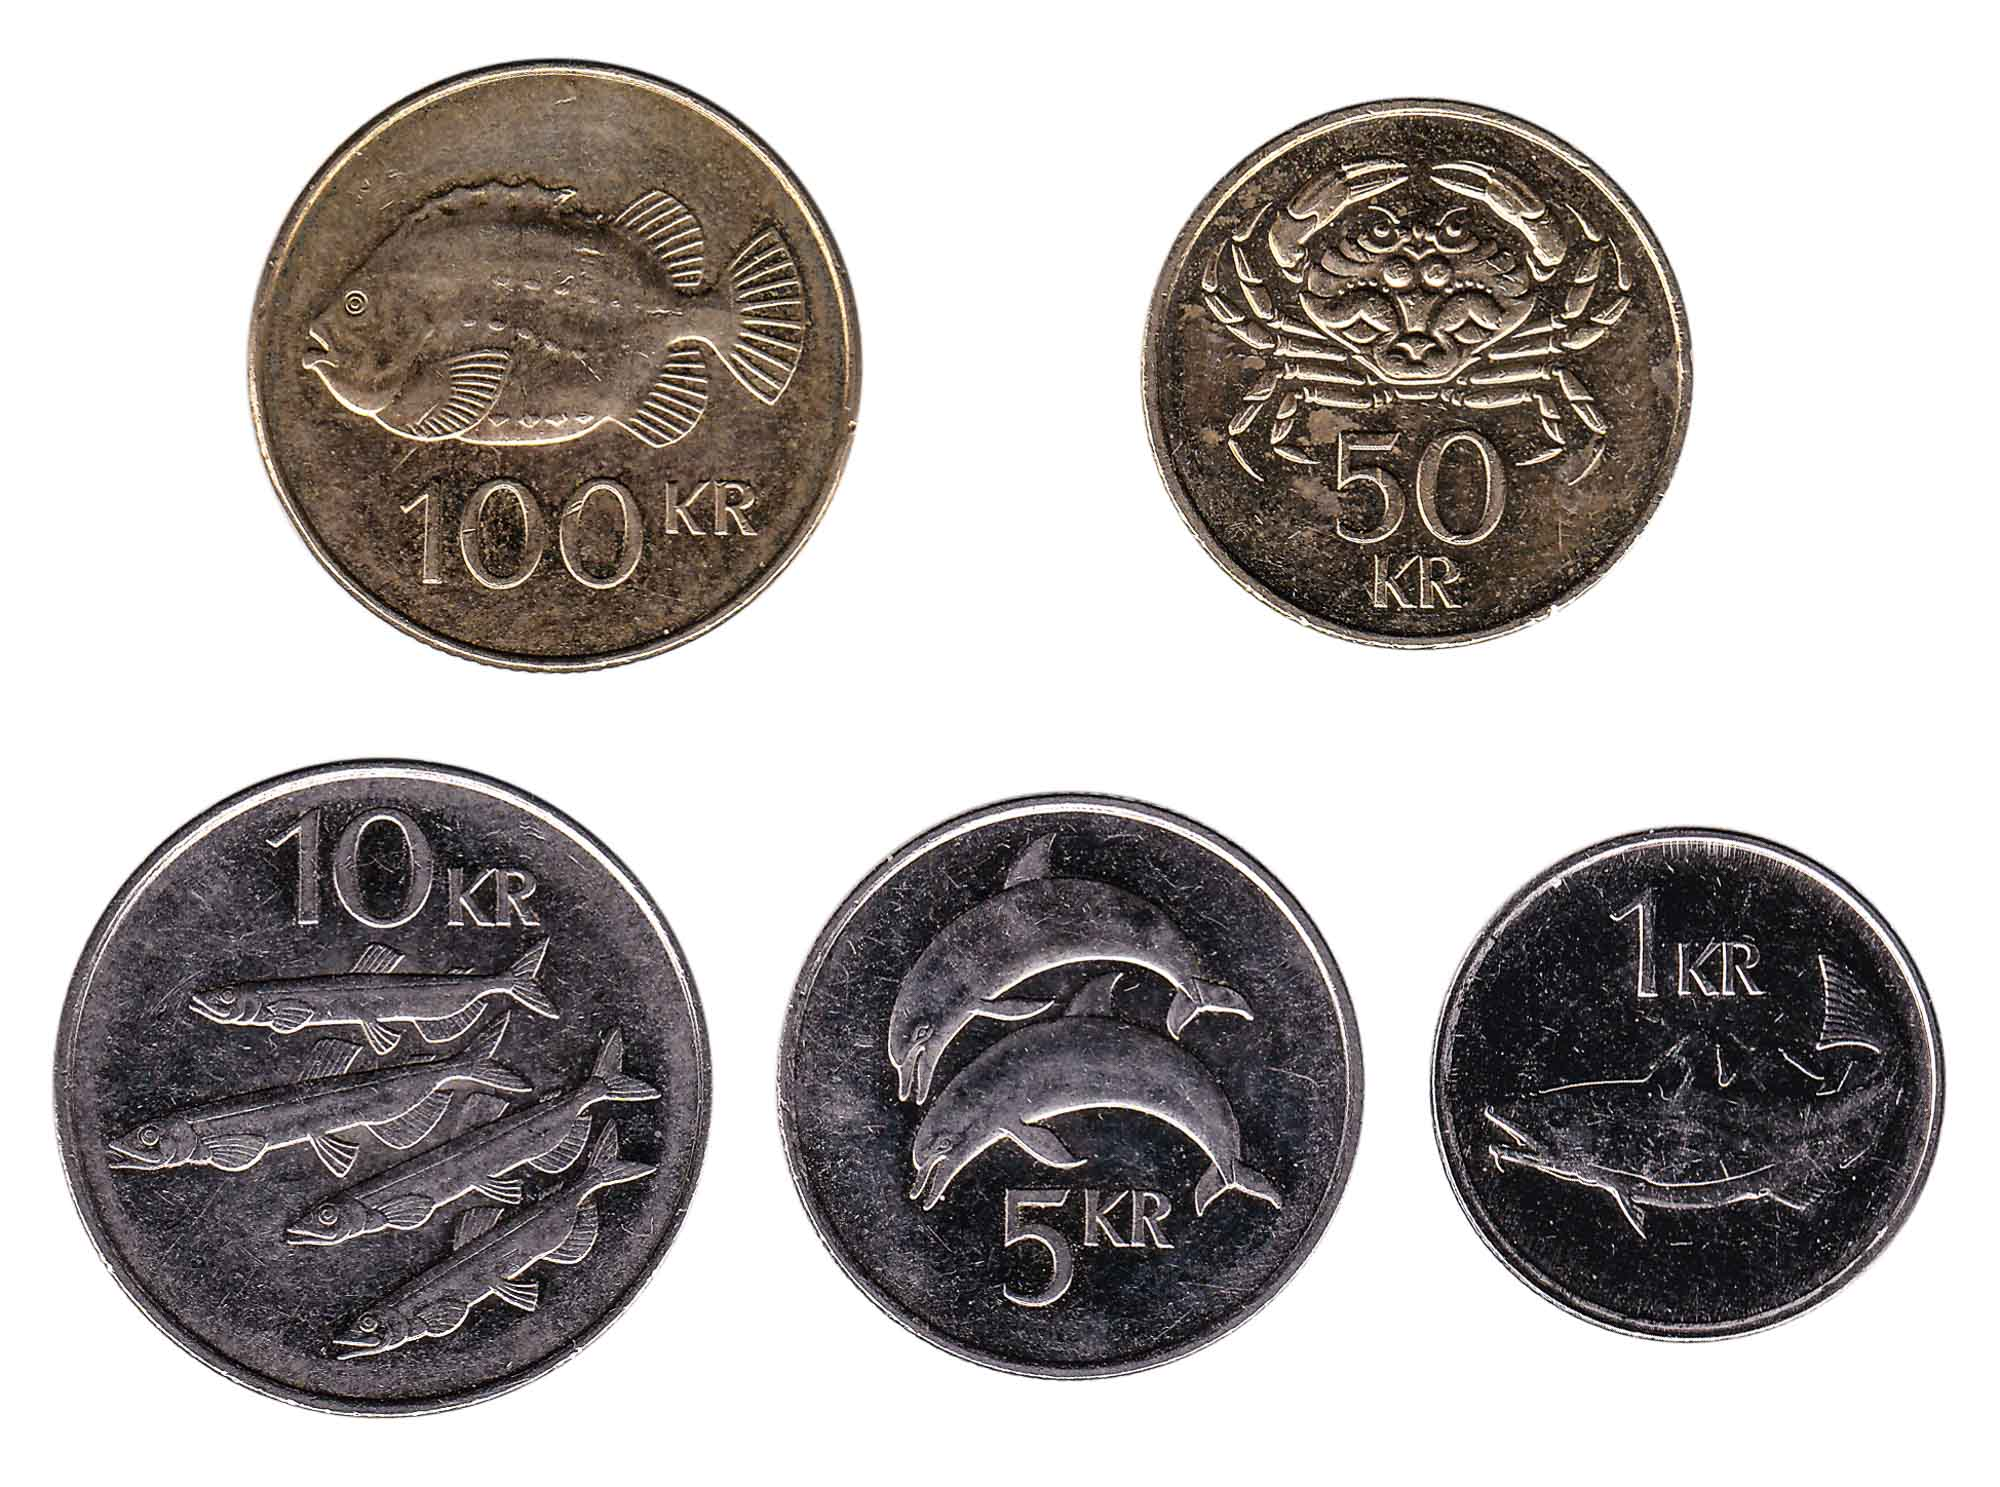 Icelandic krona coins